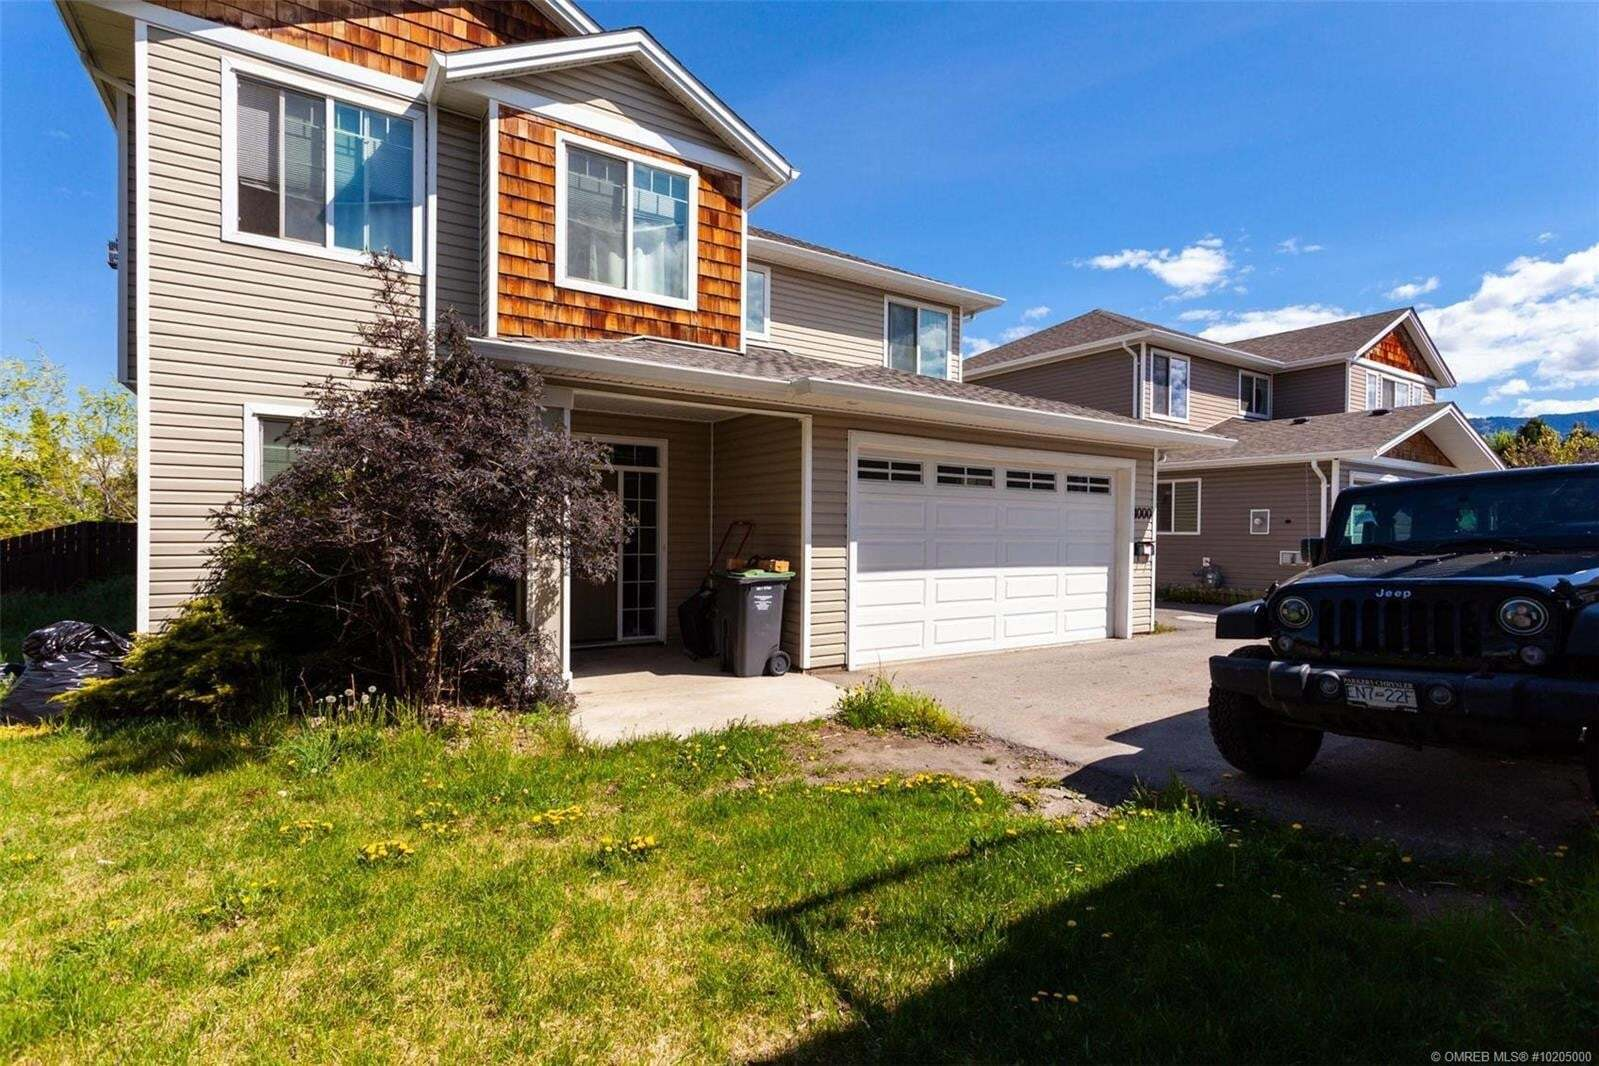 House for sale at 1000 Graham Rd Kelowna British Columbia - MLS: 10205000